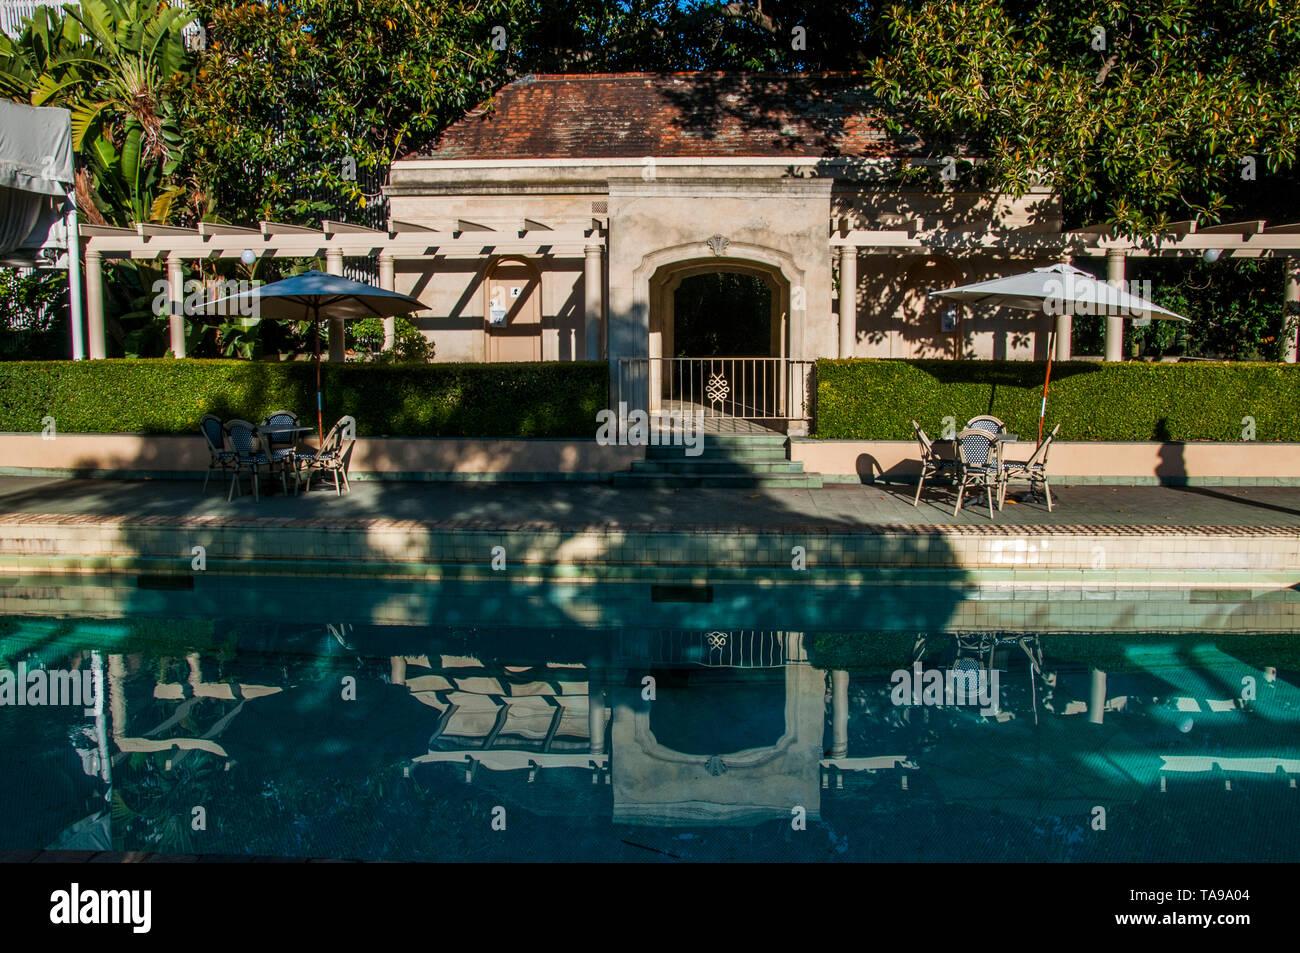 1930s Swimming pool replaced Frederick Sargood's original ballroom at Rippon Lea Estate, Elsternwick, Melbourne, Victoria, Australia - Stock Image